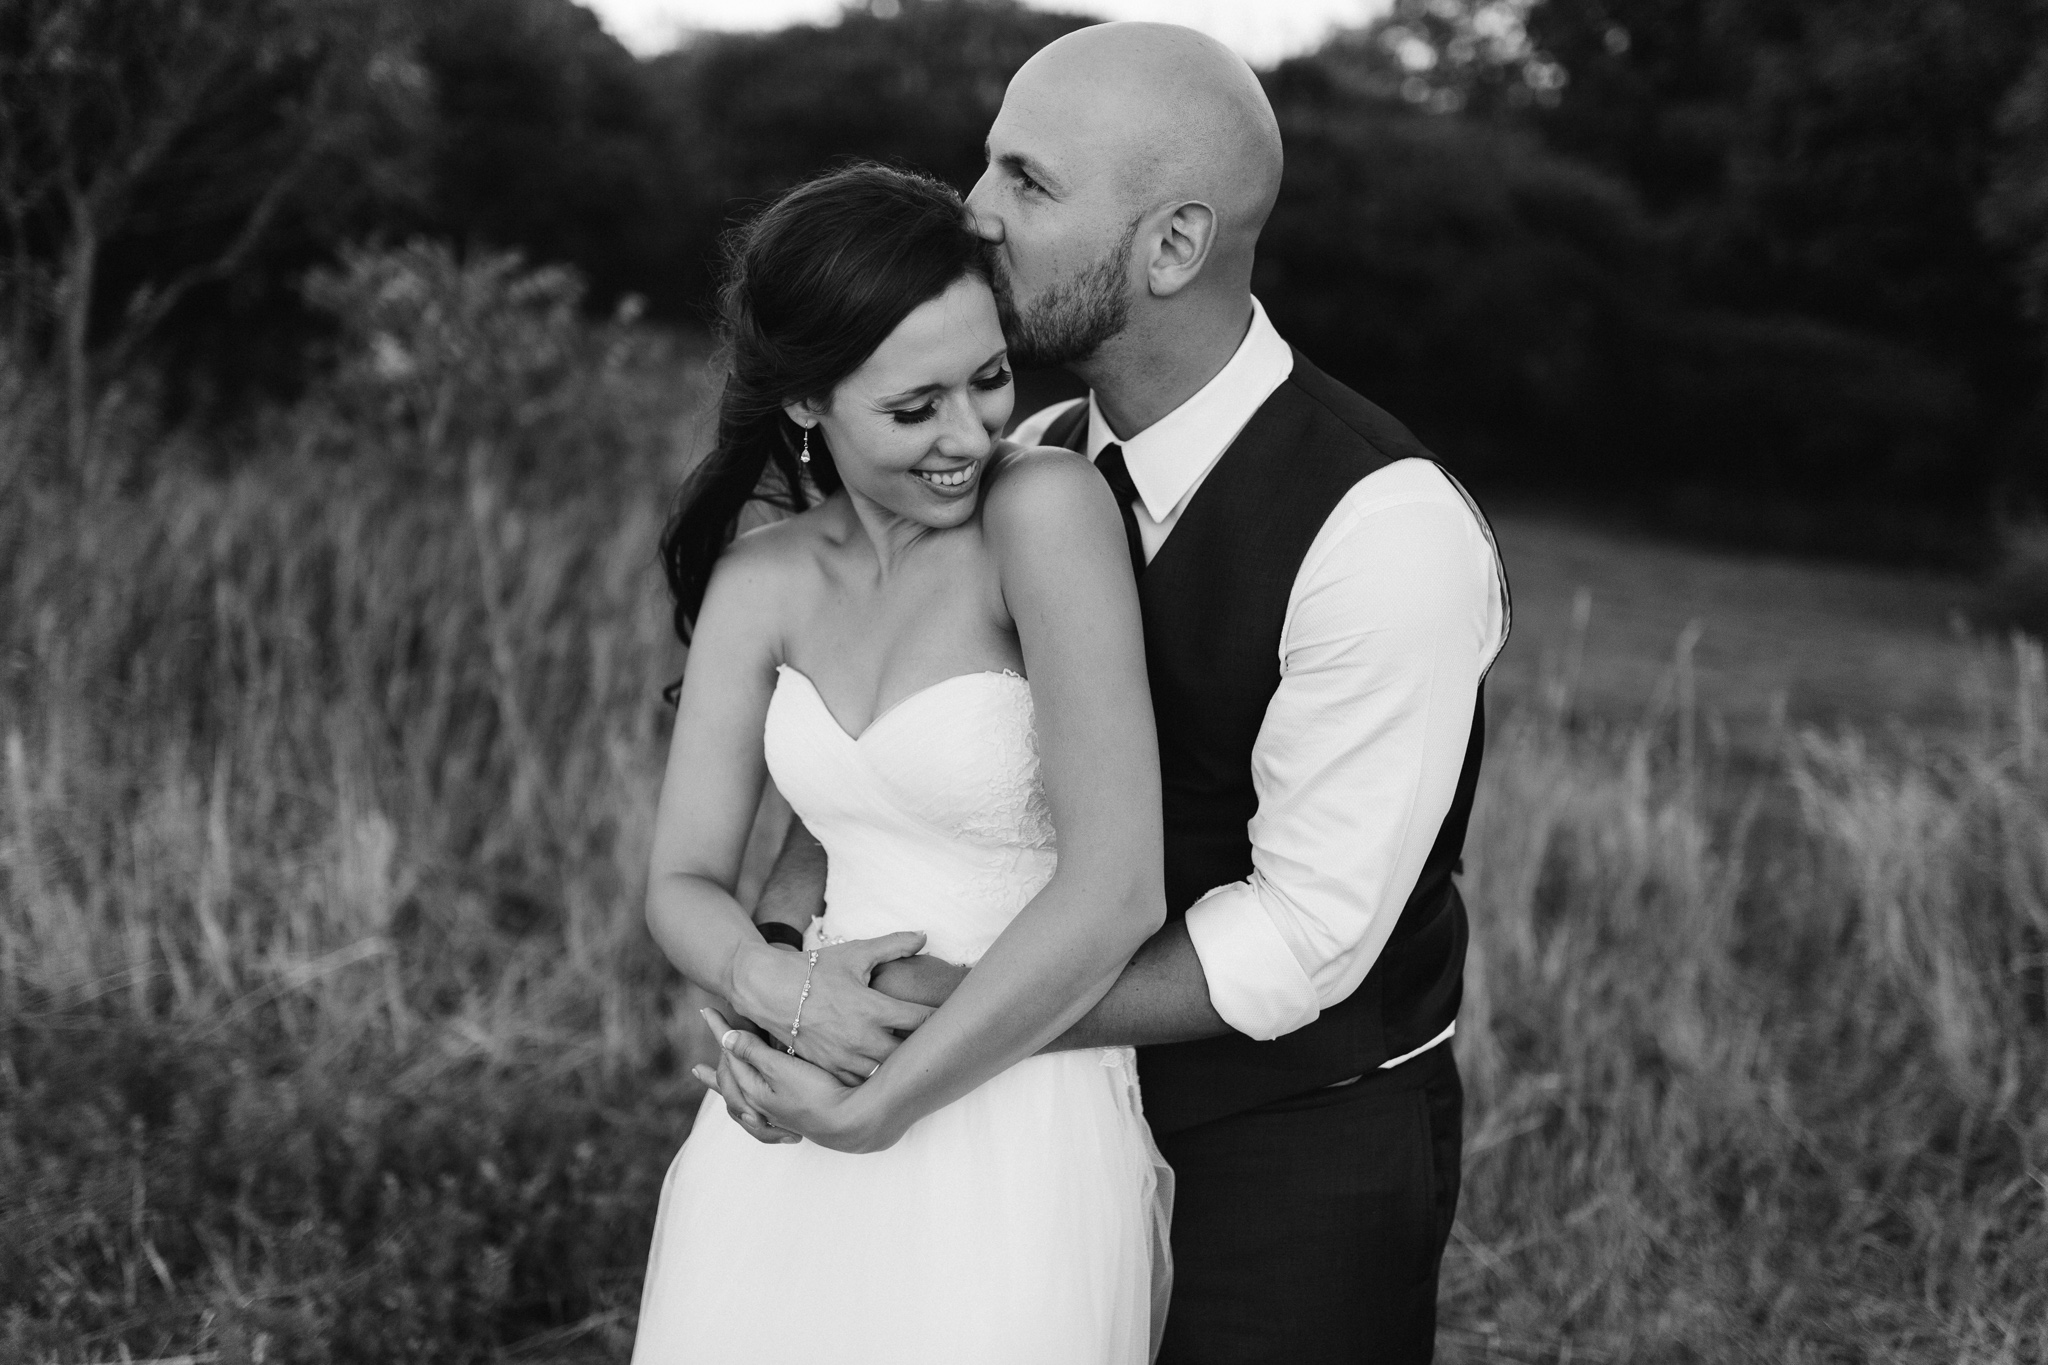 springer-house-burlington-wedding-photographer-610-of-756.jpg